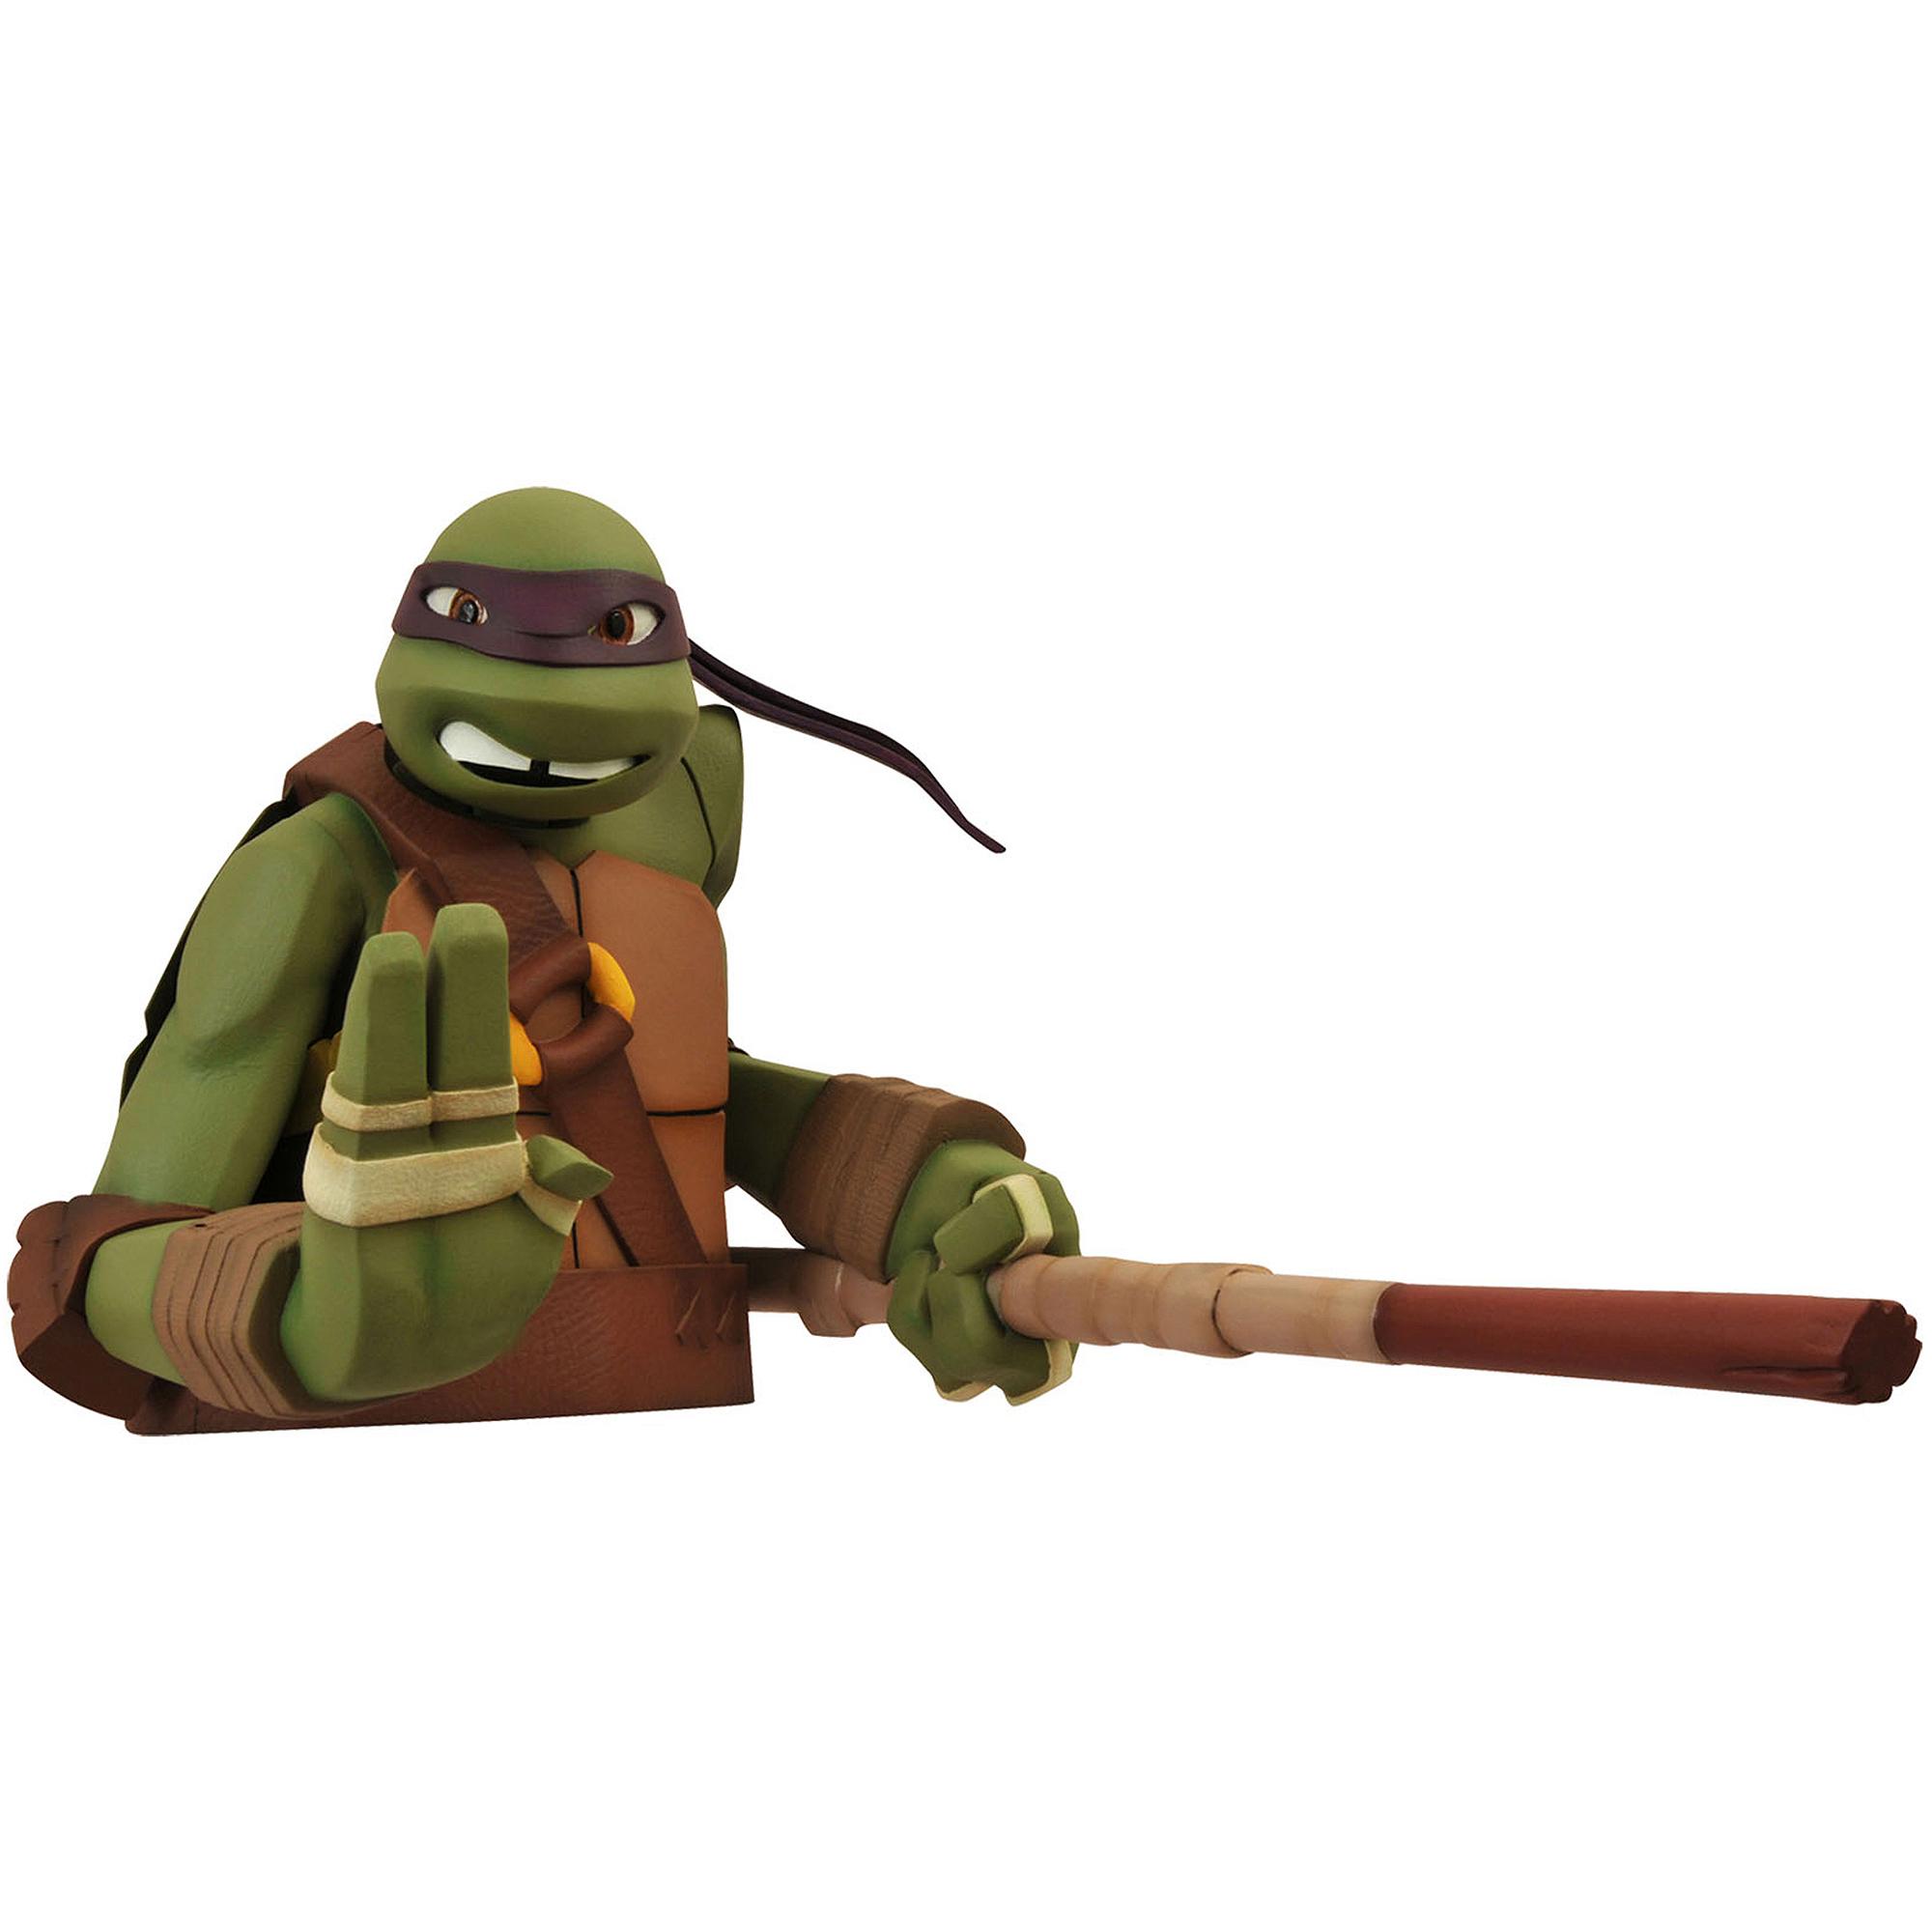 Diamond Select Toys Teenage Mutant Ninja Turtles Donatello Bust Bank